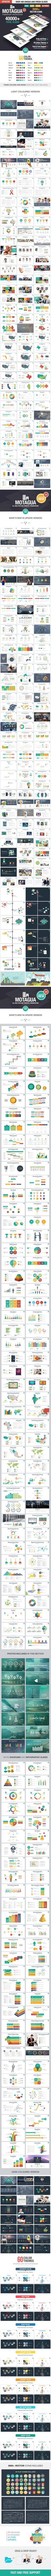 Motagua - Multipurpose PowerPoint Template - Business PowerPoint Templates